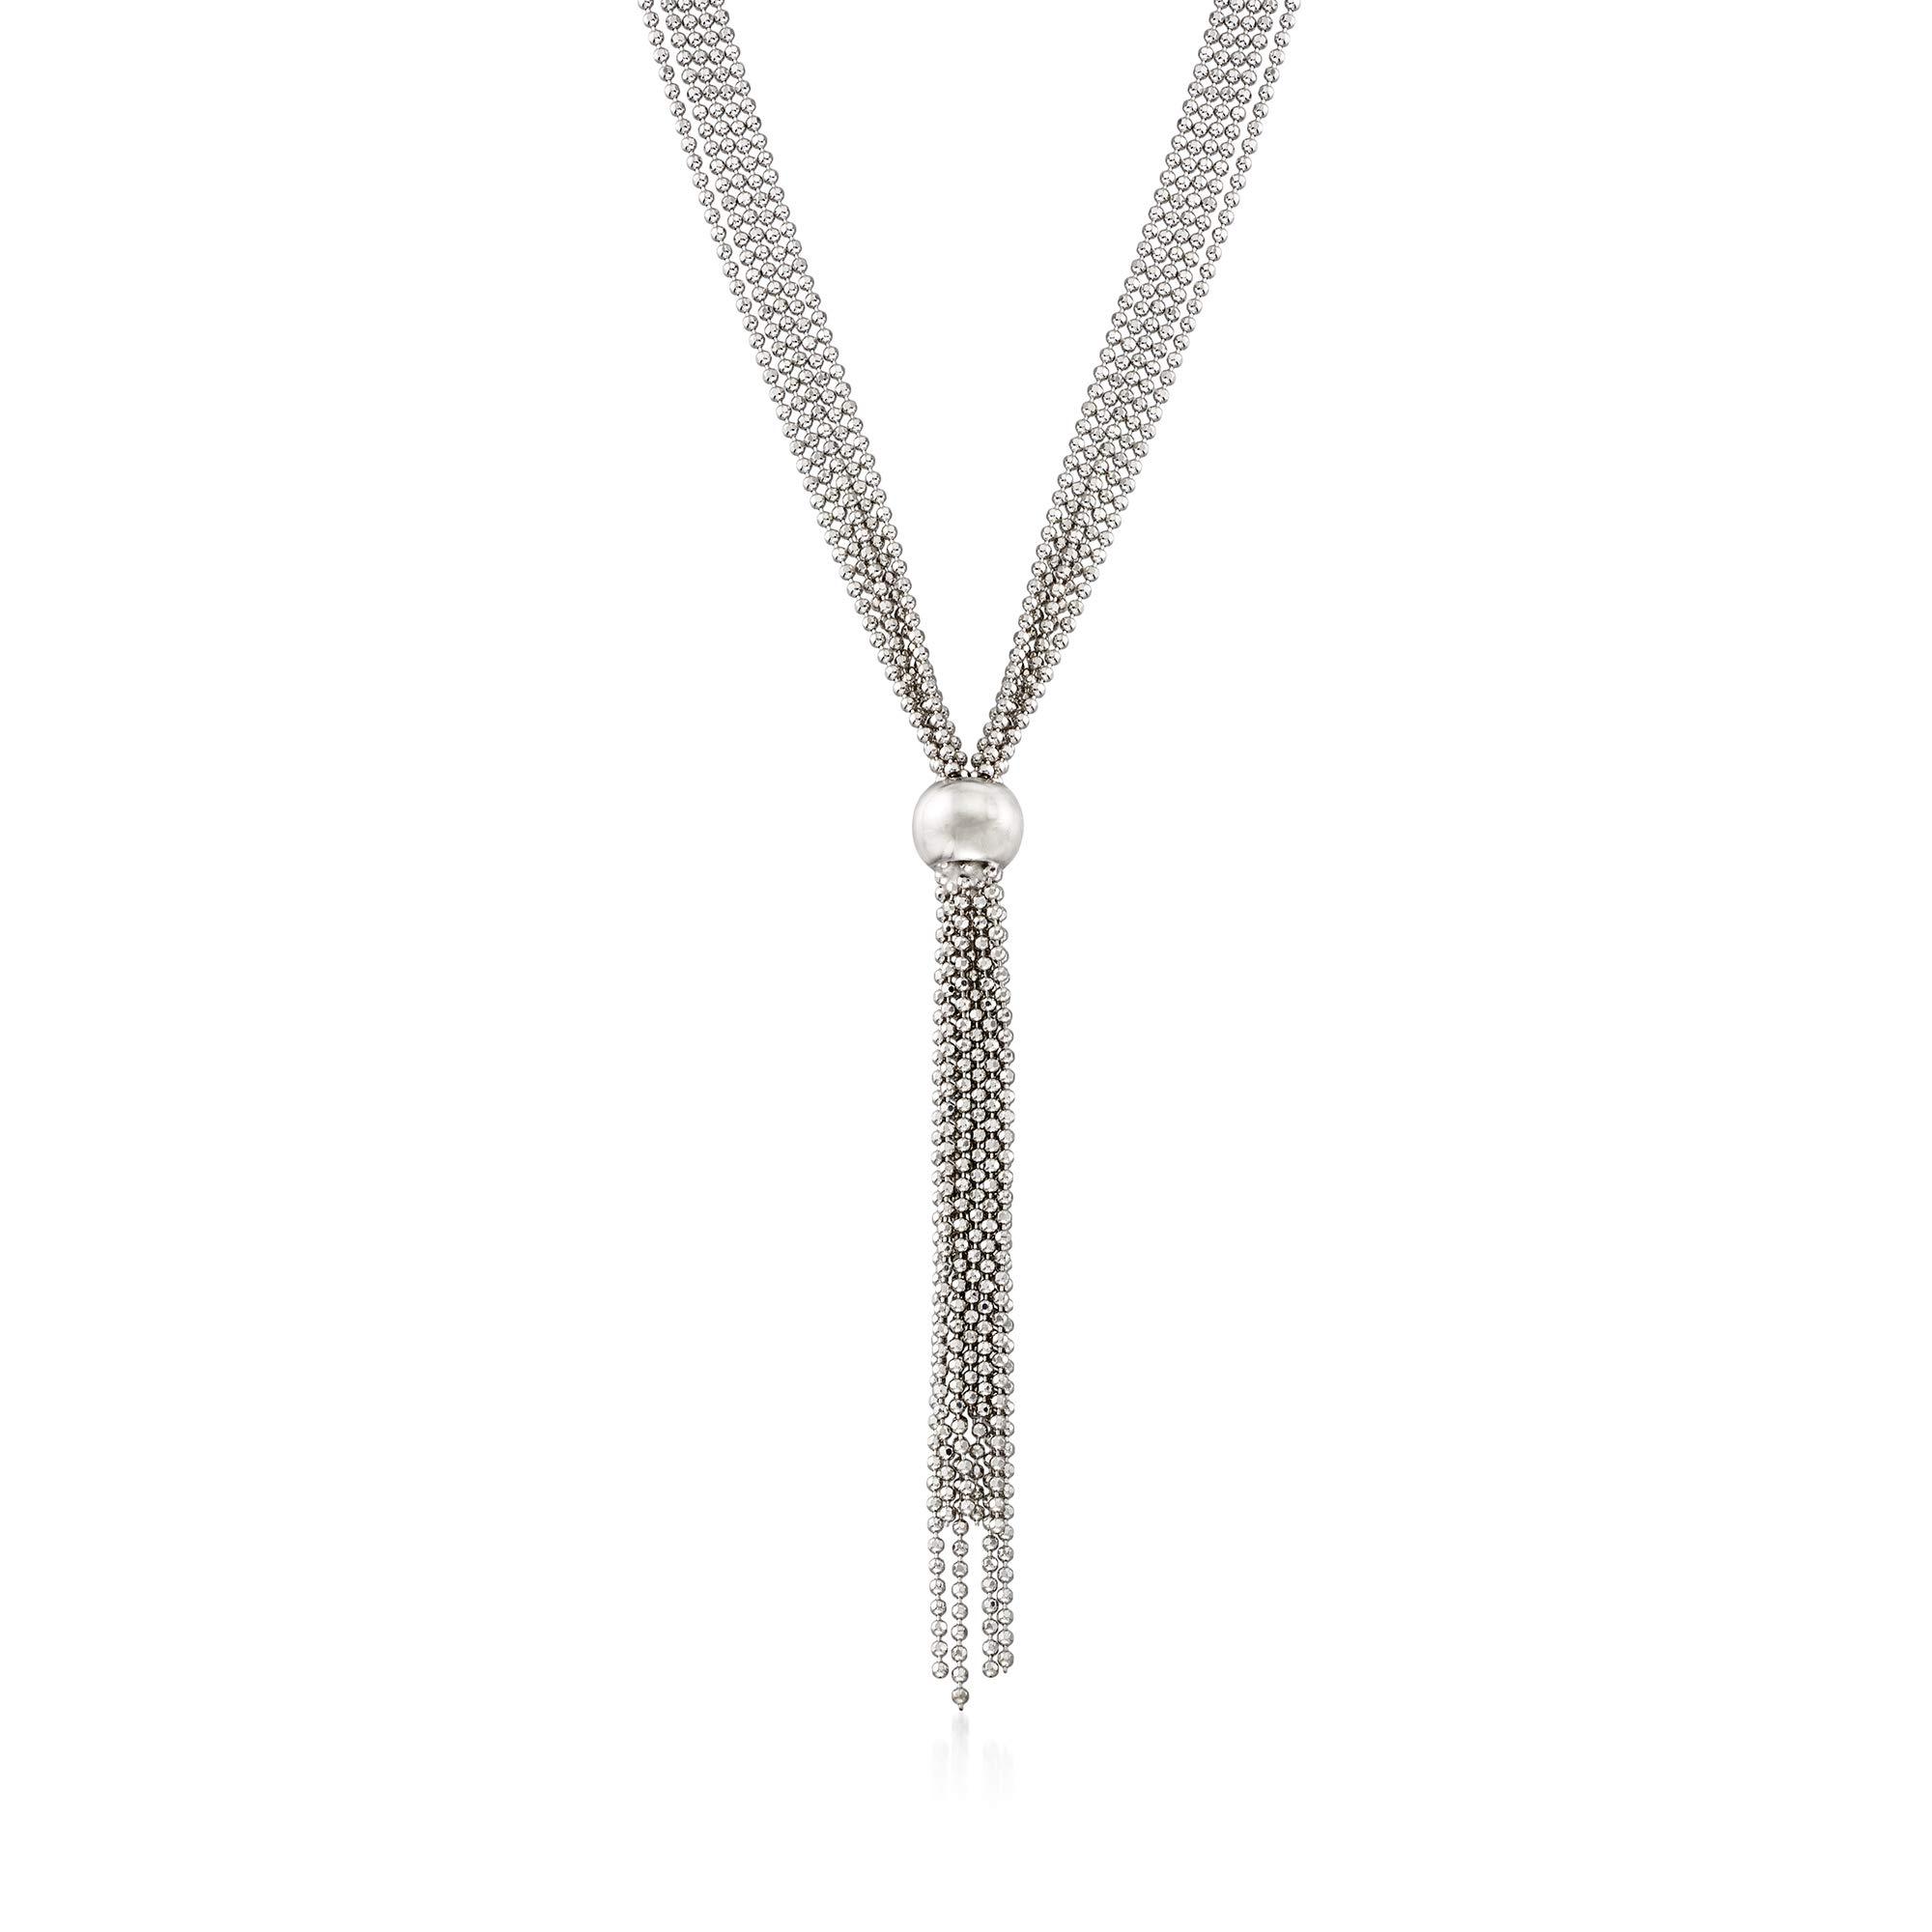 Ross-Simons Italian Sterling Silver Bead Chain Tassel Necklace